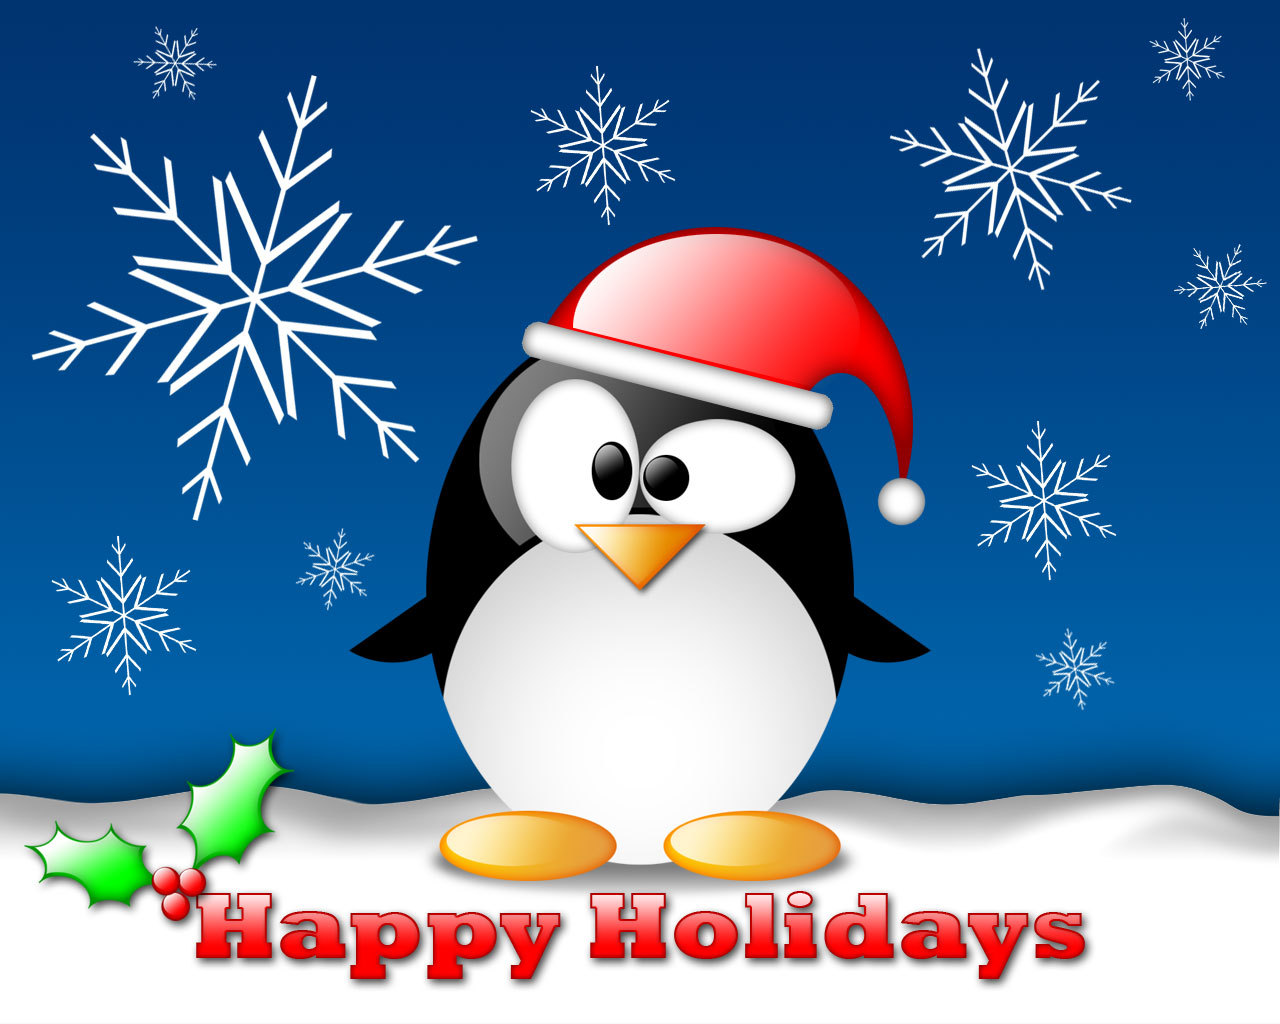 Senseless Ramblings Of The Mindless Christmas Holidays And Xmas